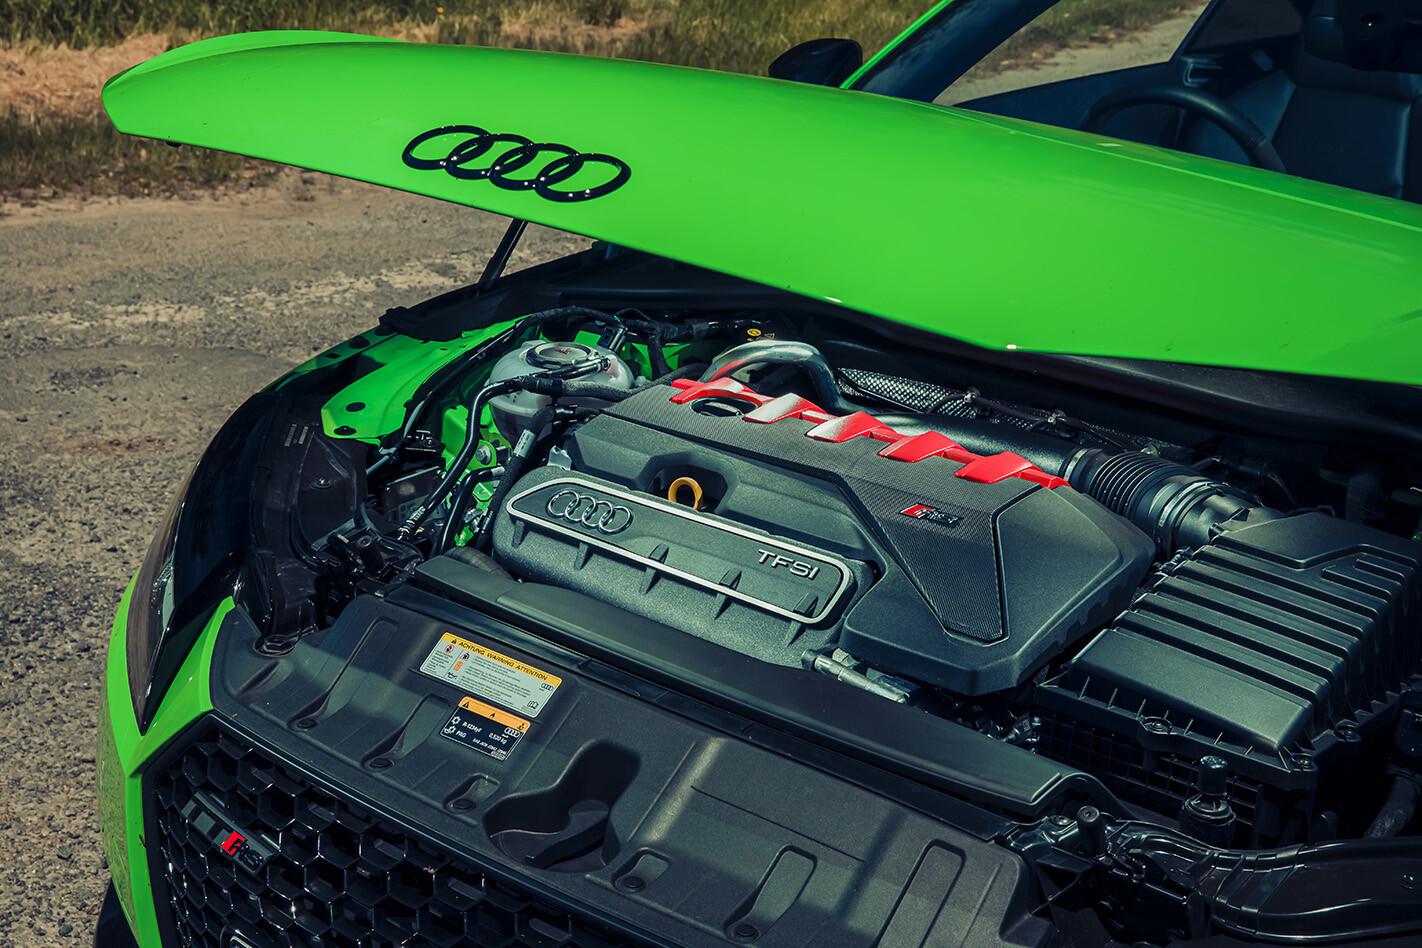 Audi TT RS engine